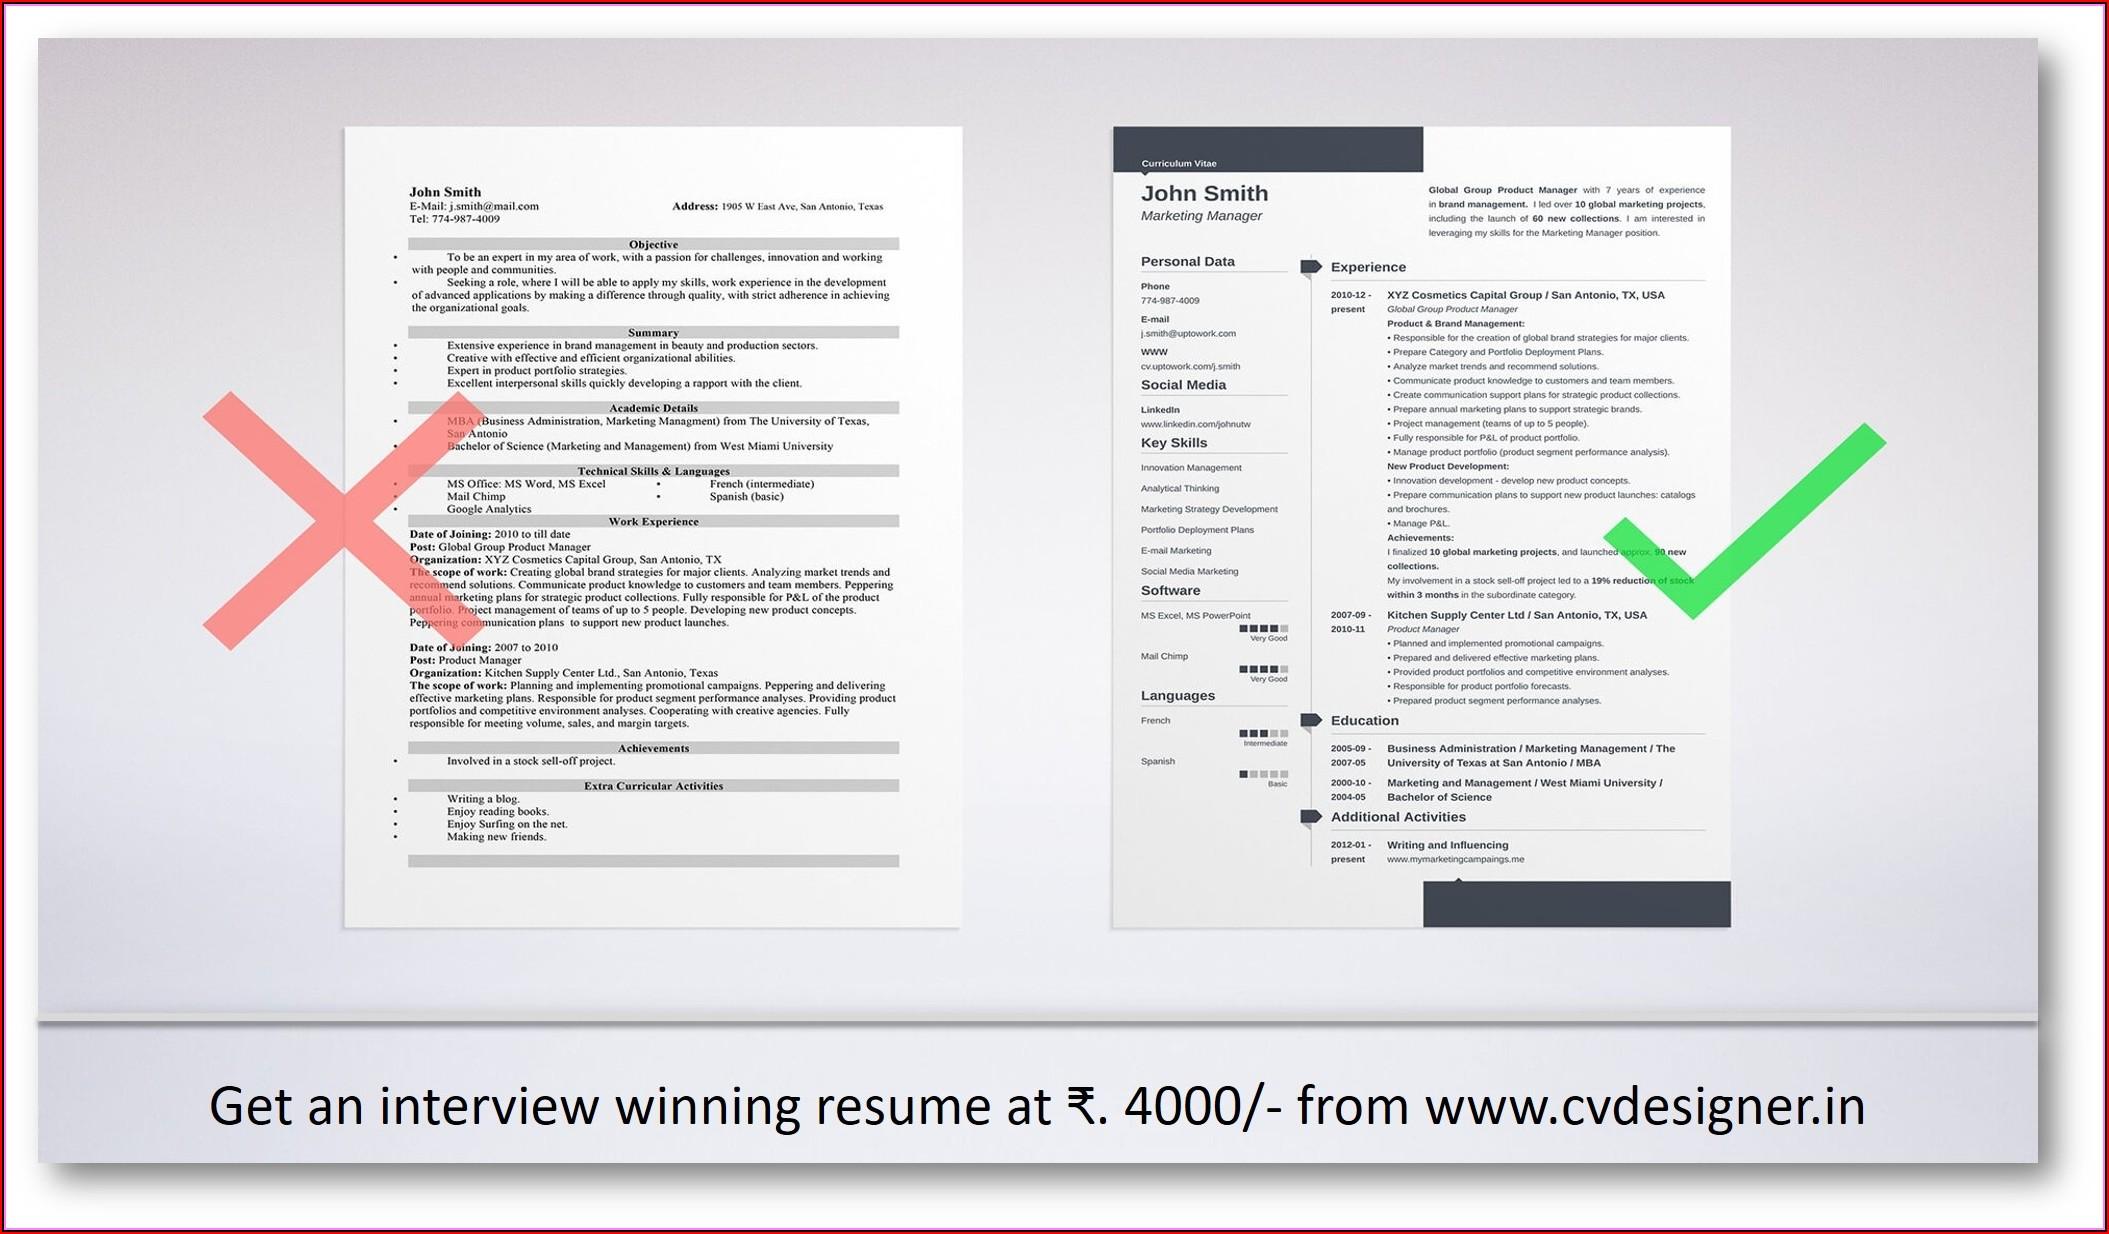 Resume Writing Consultants In Chennai